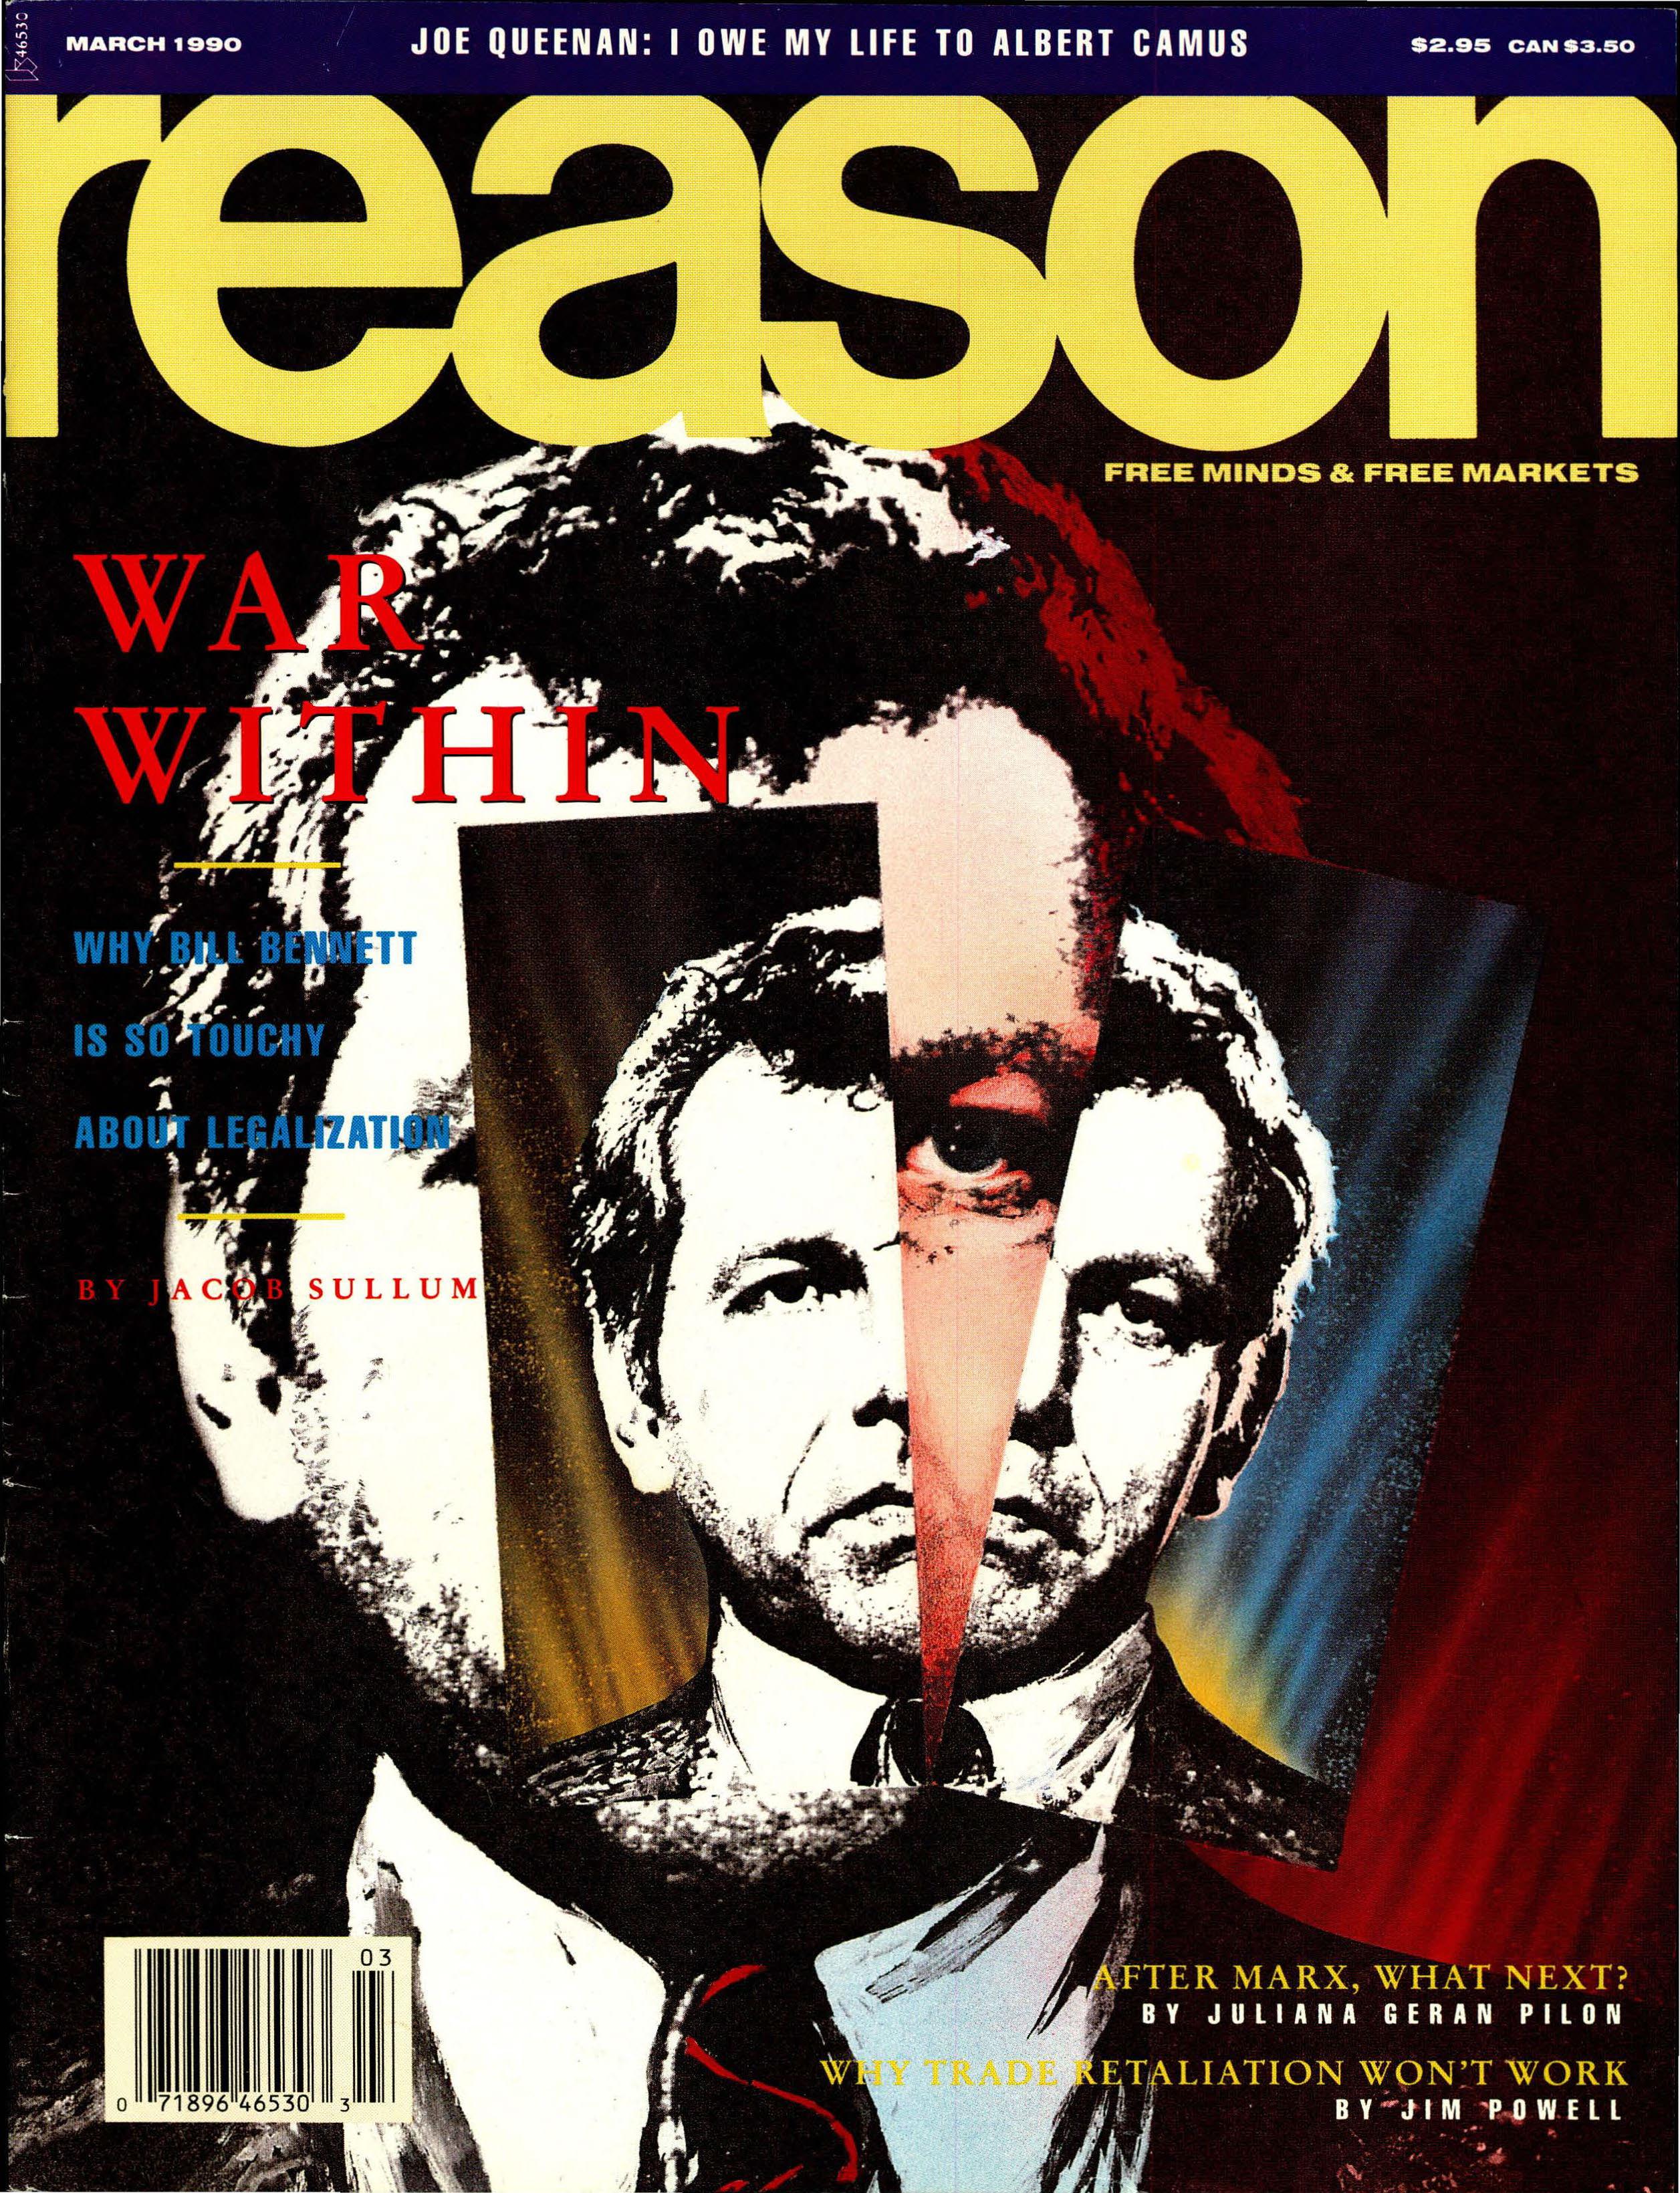 Reason Magazine, March 1990 cover image